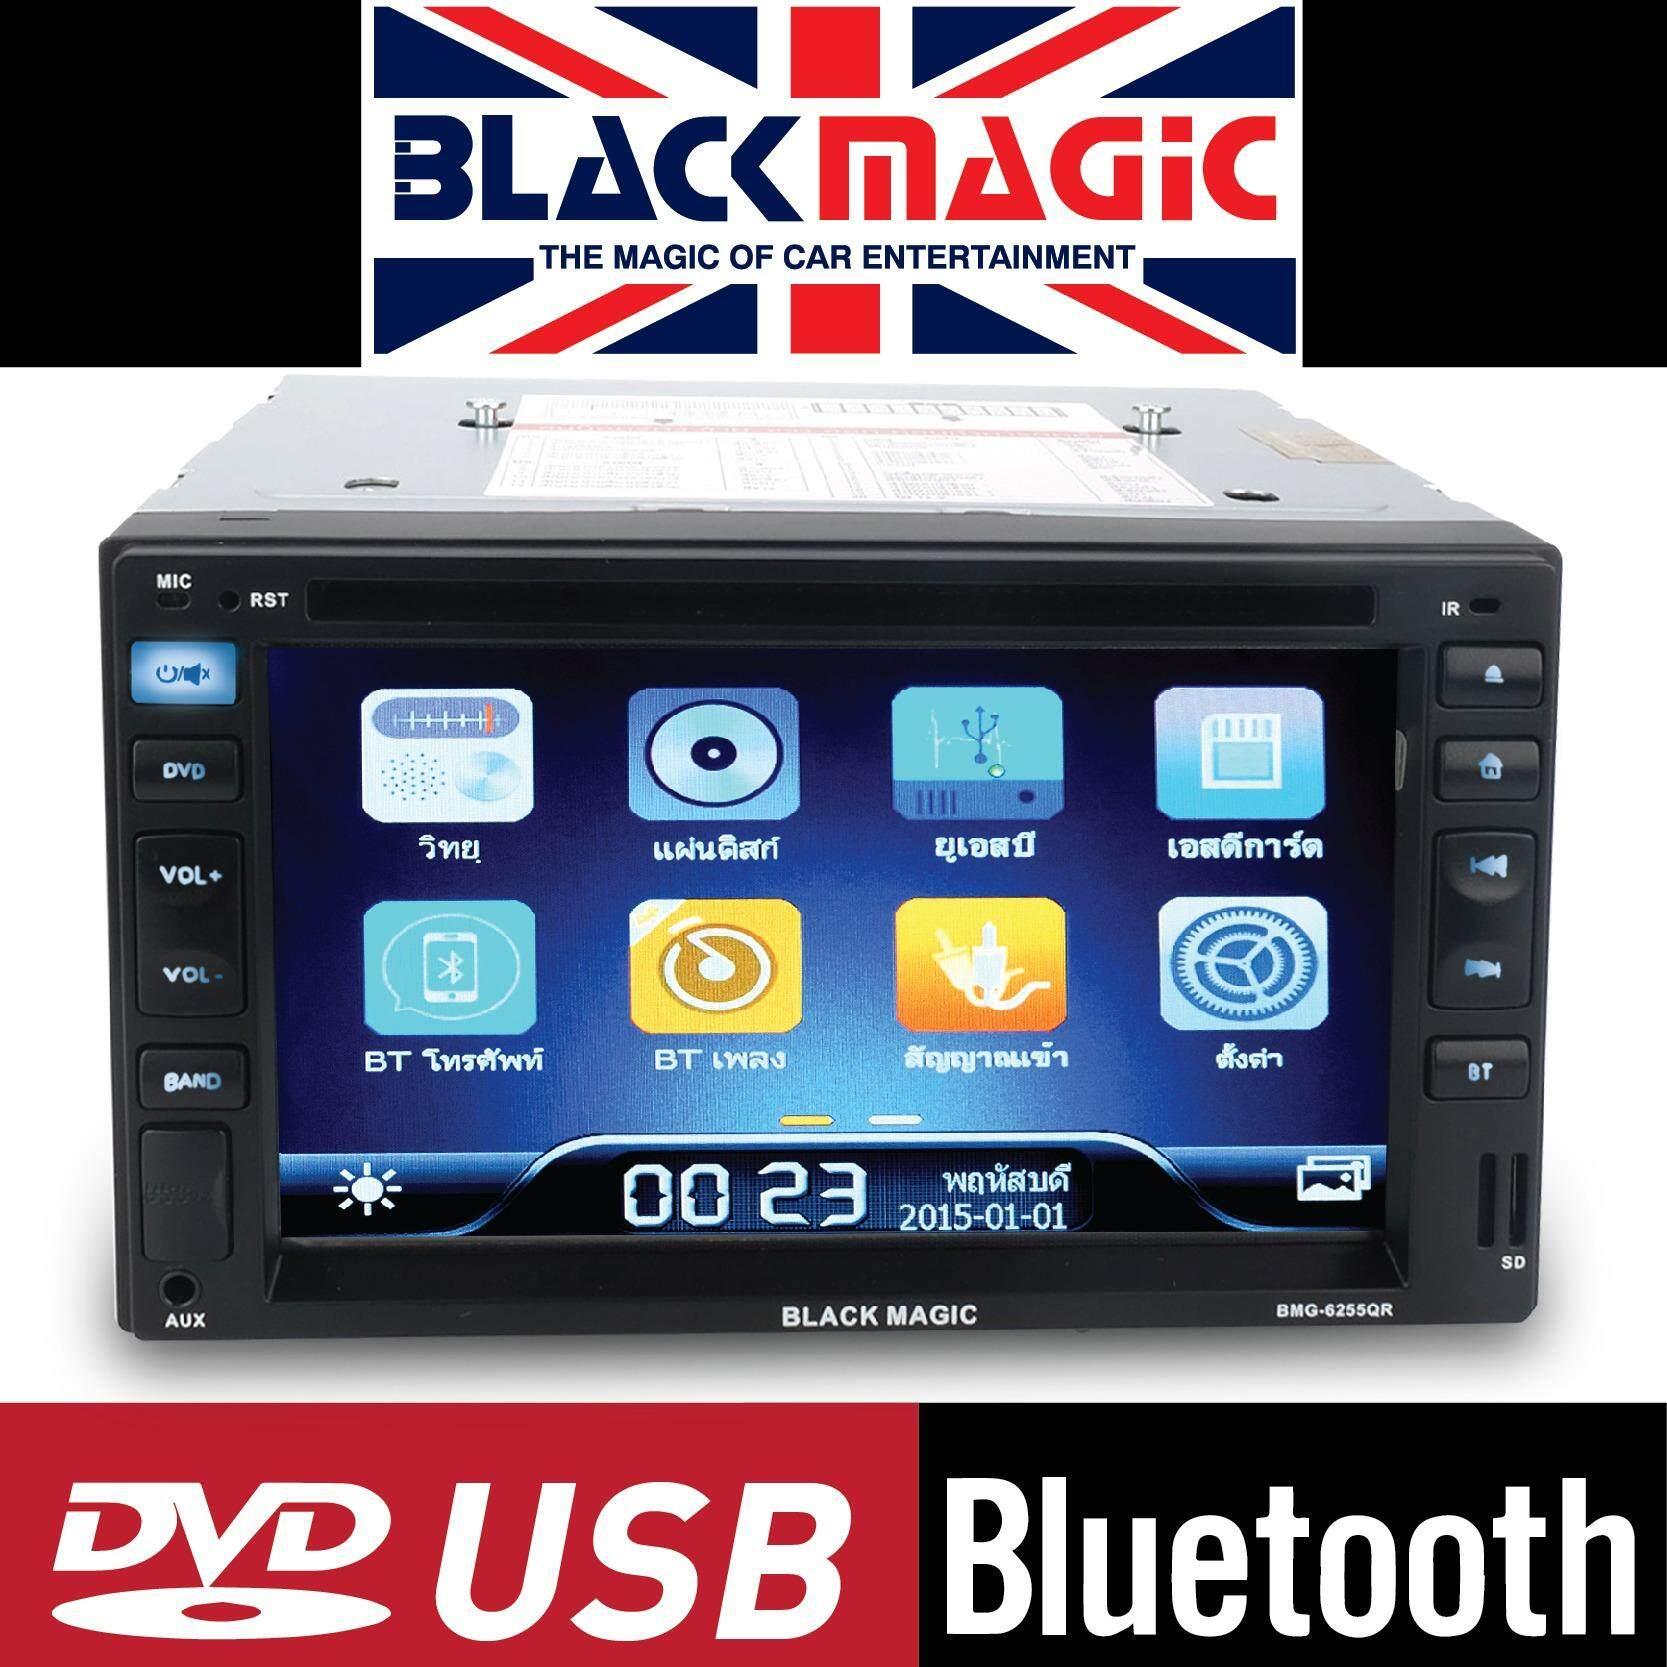 BLACK MAGIC วิทยุติดรถยนต์ จอติดรถยนต์ จอ2ดิน จอ2DIN เครื่องเล่นติดรถยนต์ เครื่องเสียงรถยนต์ ตัวรับสัญญาณแบบสเตอริโอ แบบ 2DIN BMG-6255QR (ขนาด6.25นิ้ว)